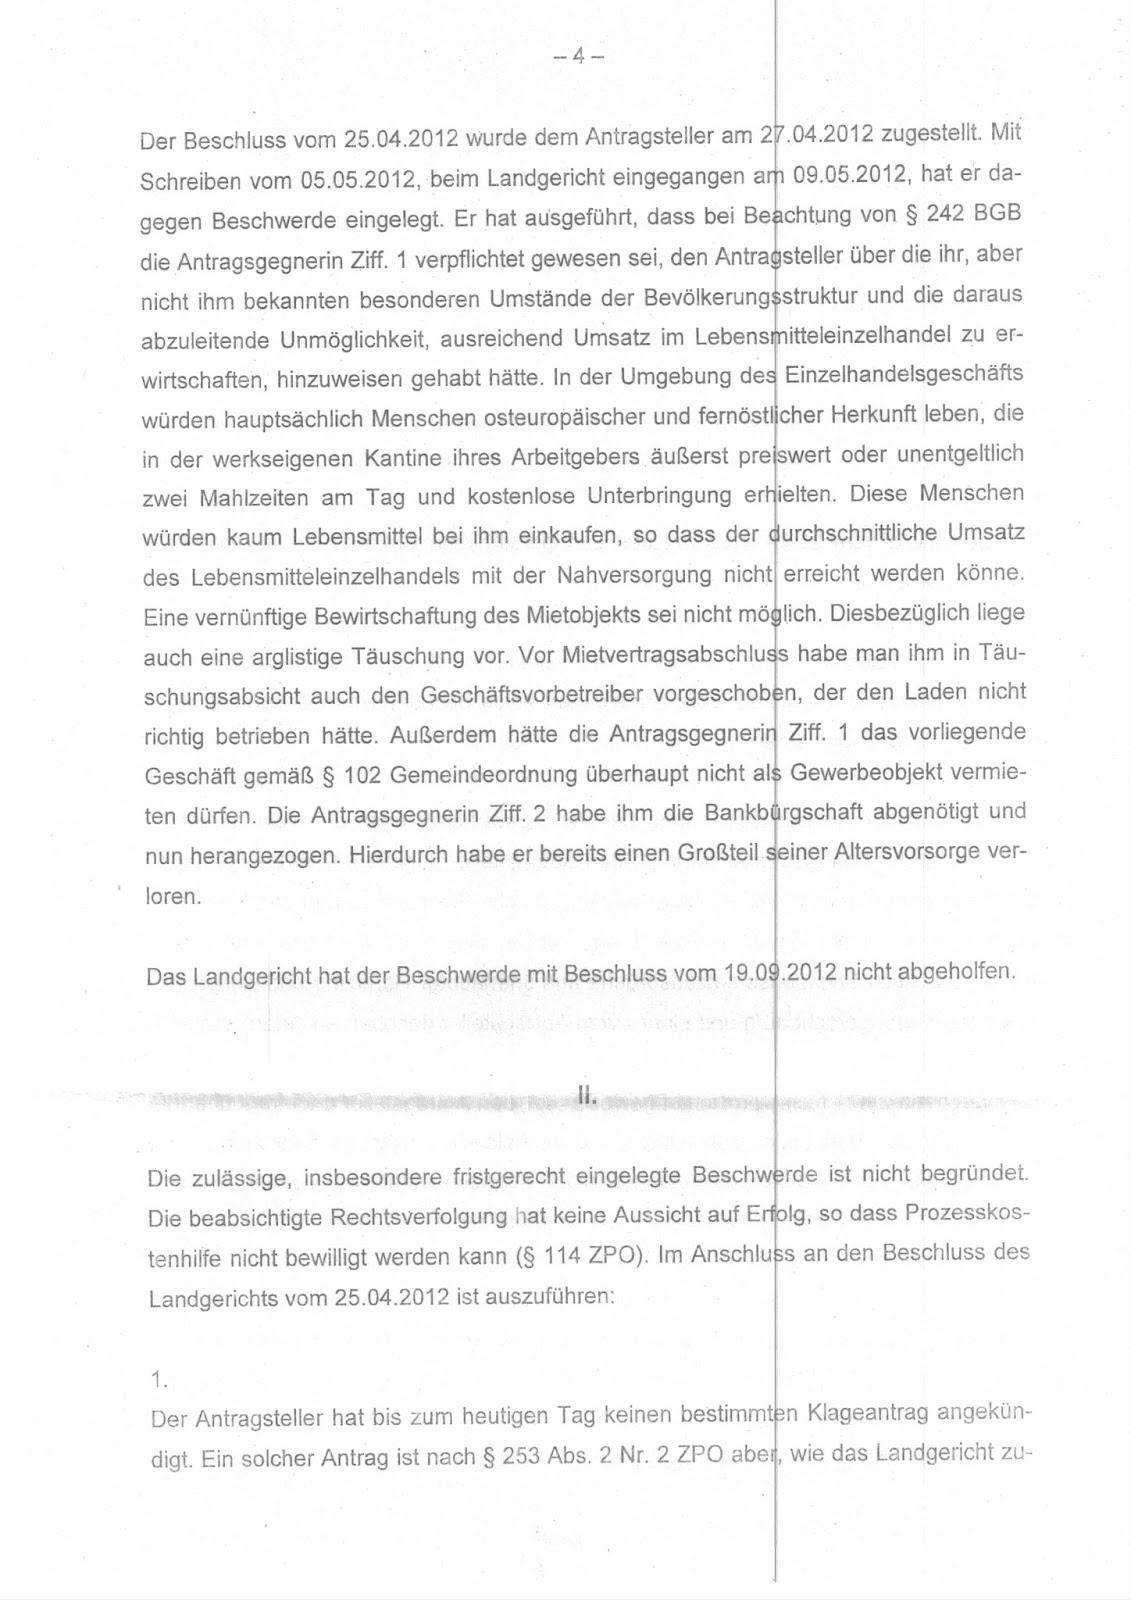 like nothing better Damen Höschen in Strumpfhosen Material for genuine